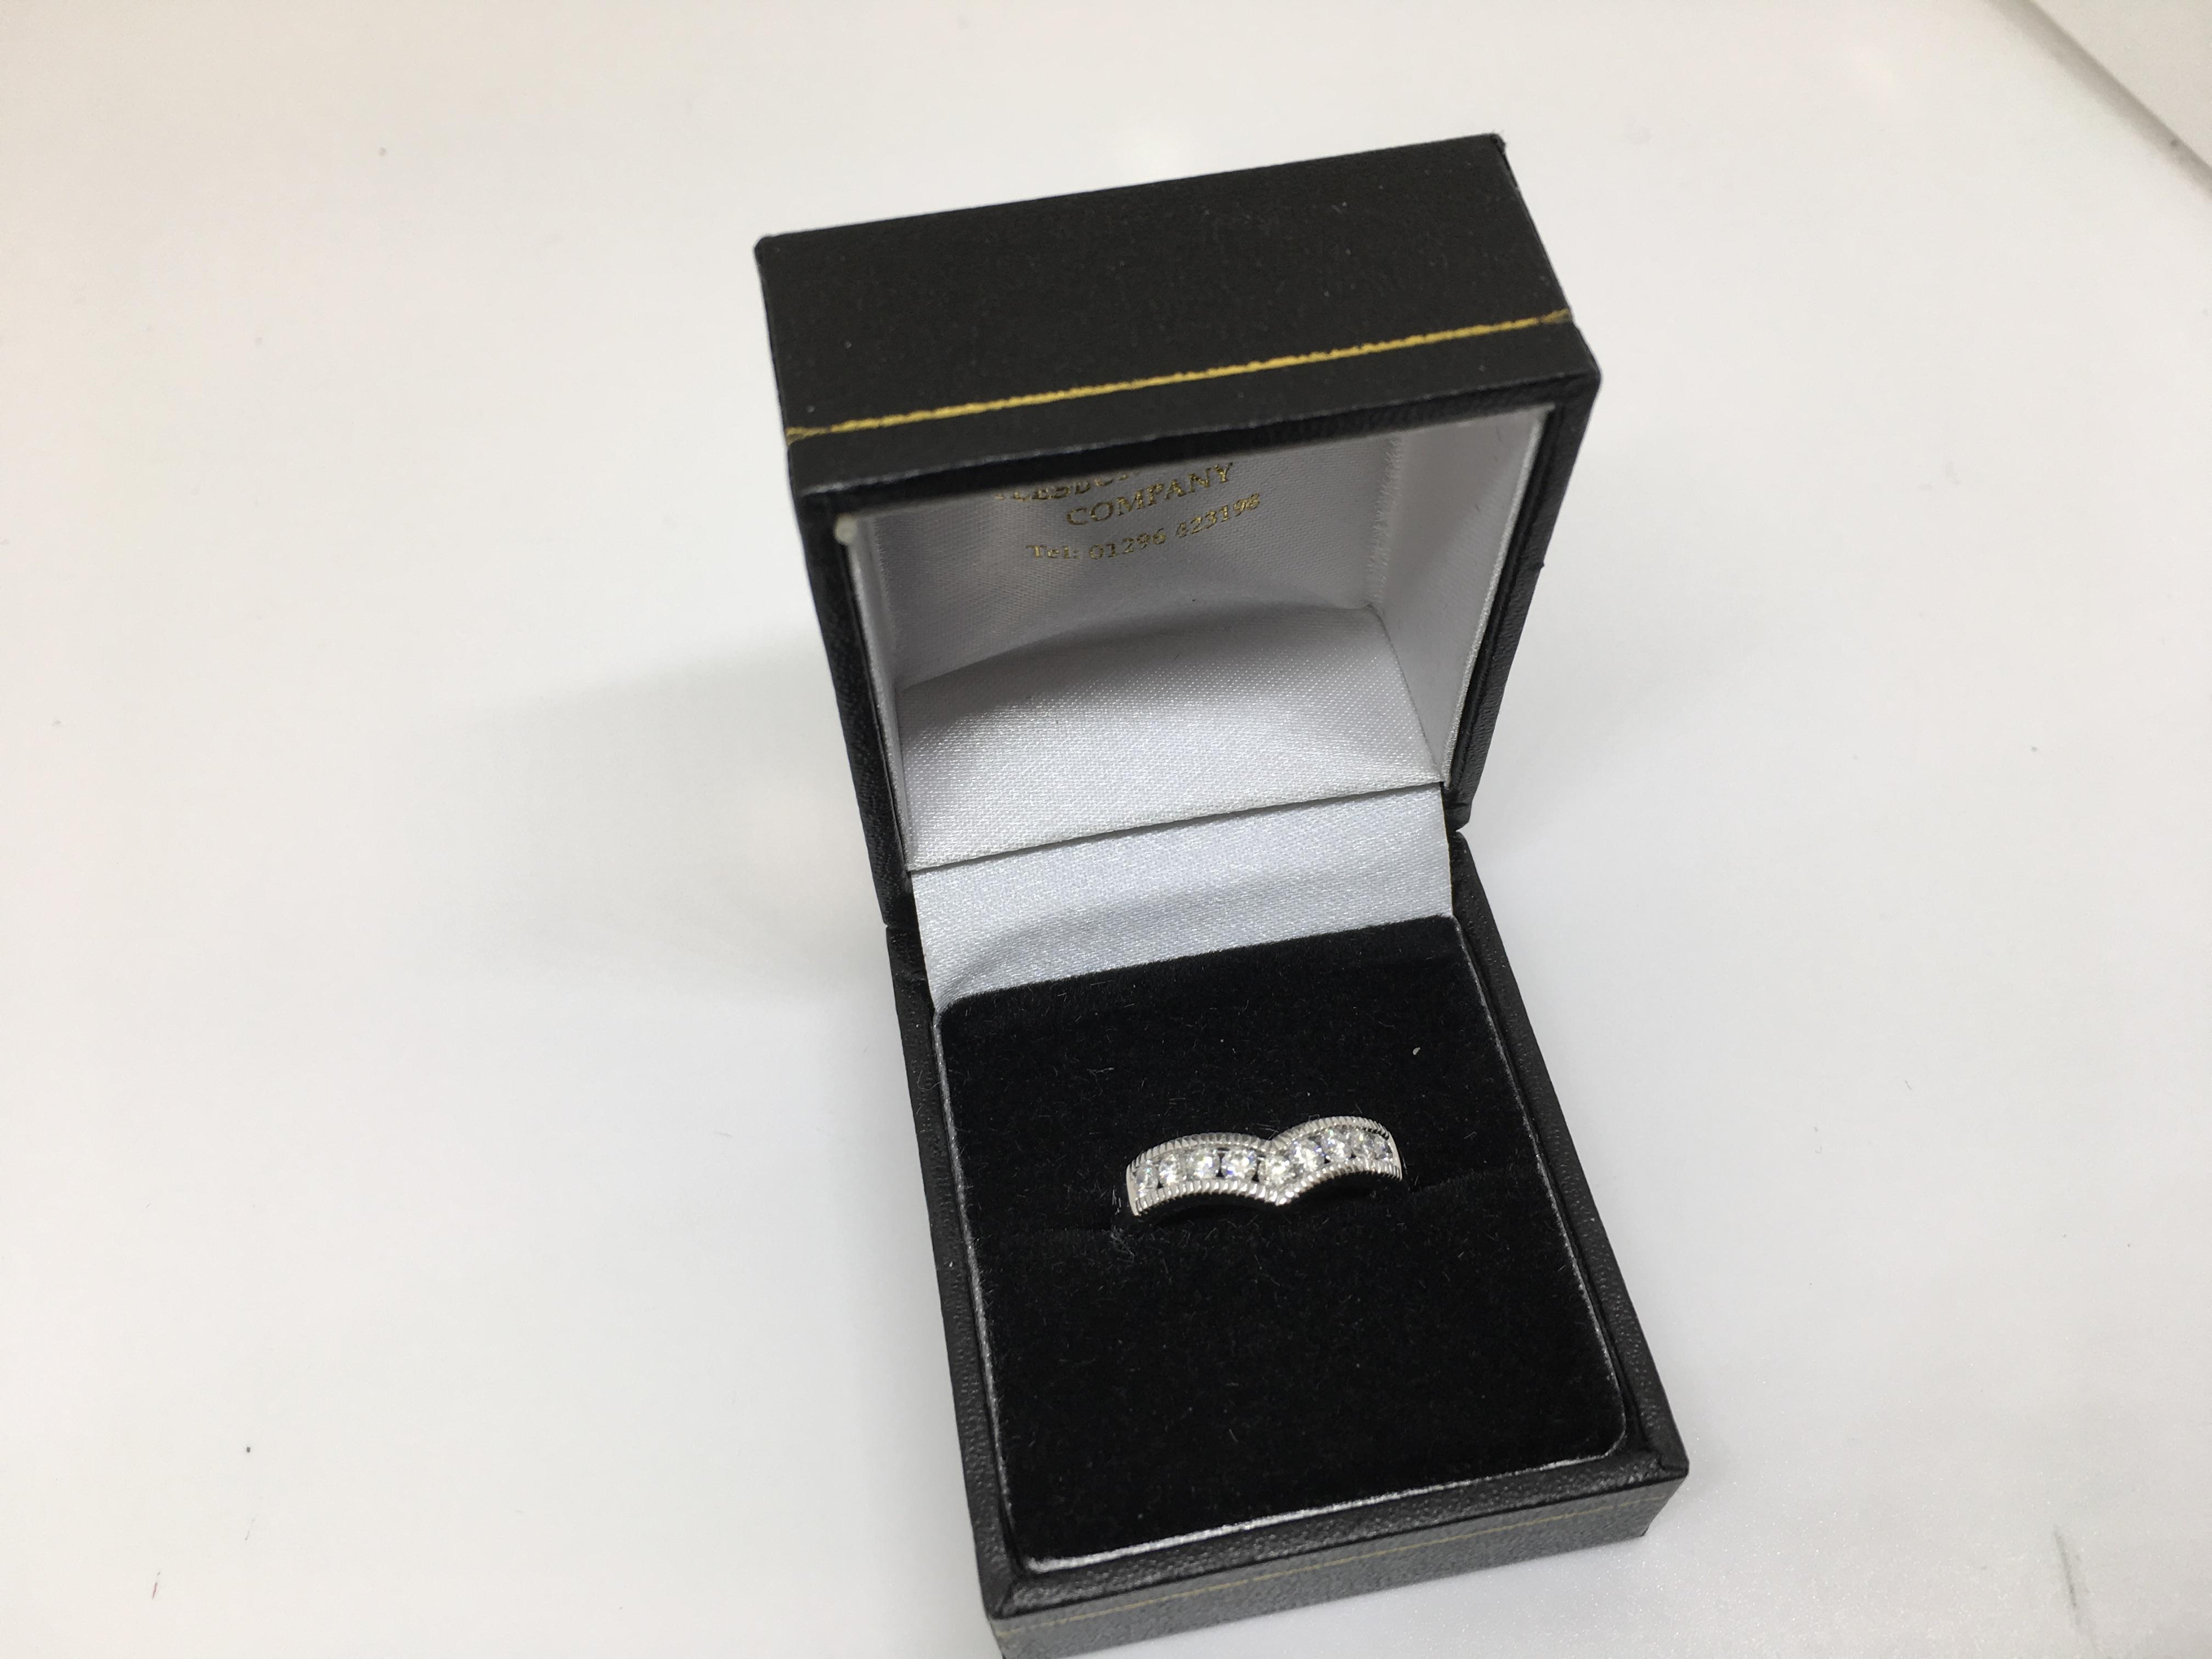 18 Carat White Gold Diamond Wishbone Ring For Most Popular Beaded Wishbone Rings (View 1 of 25)